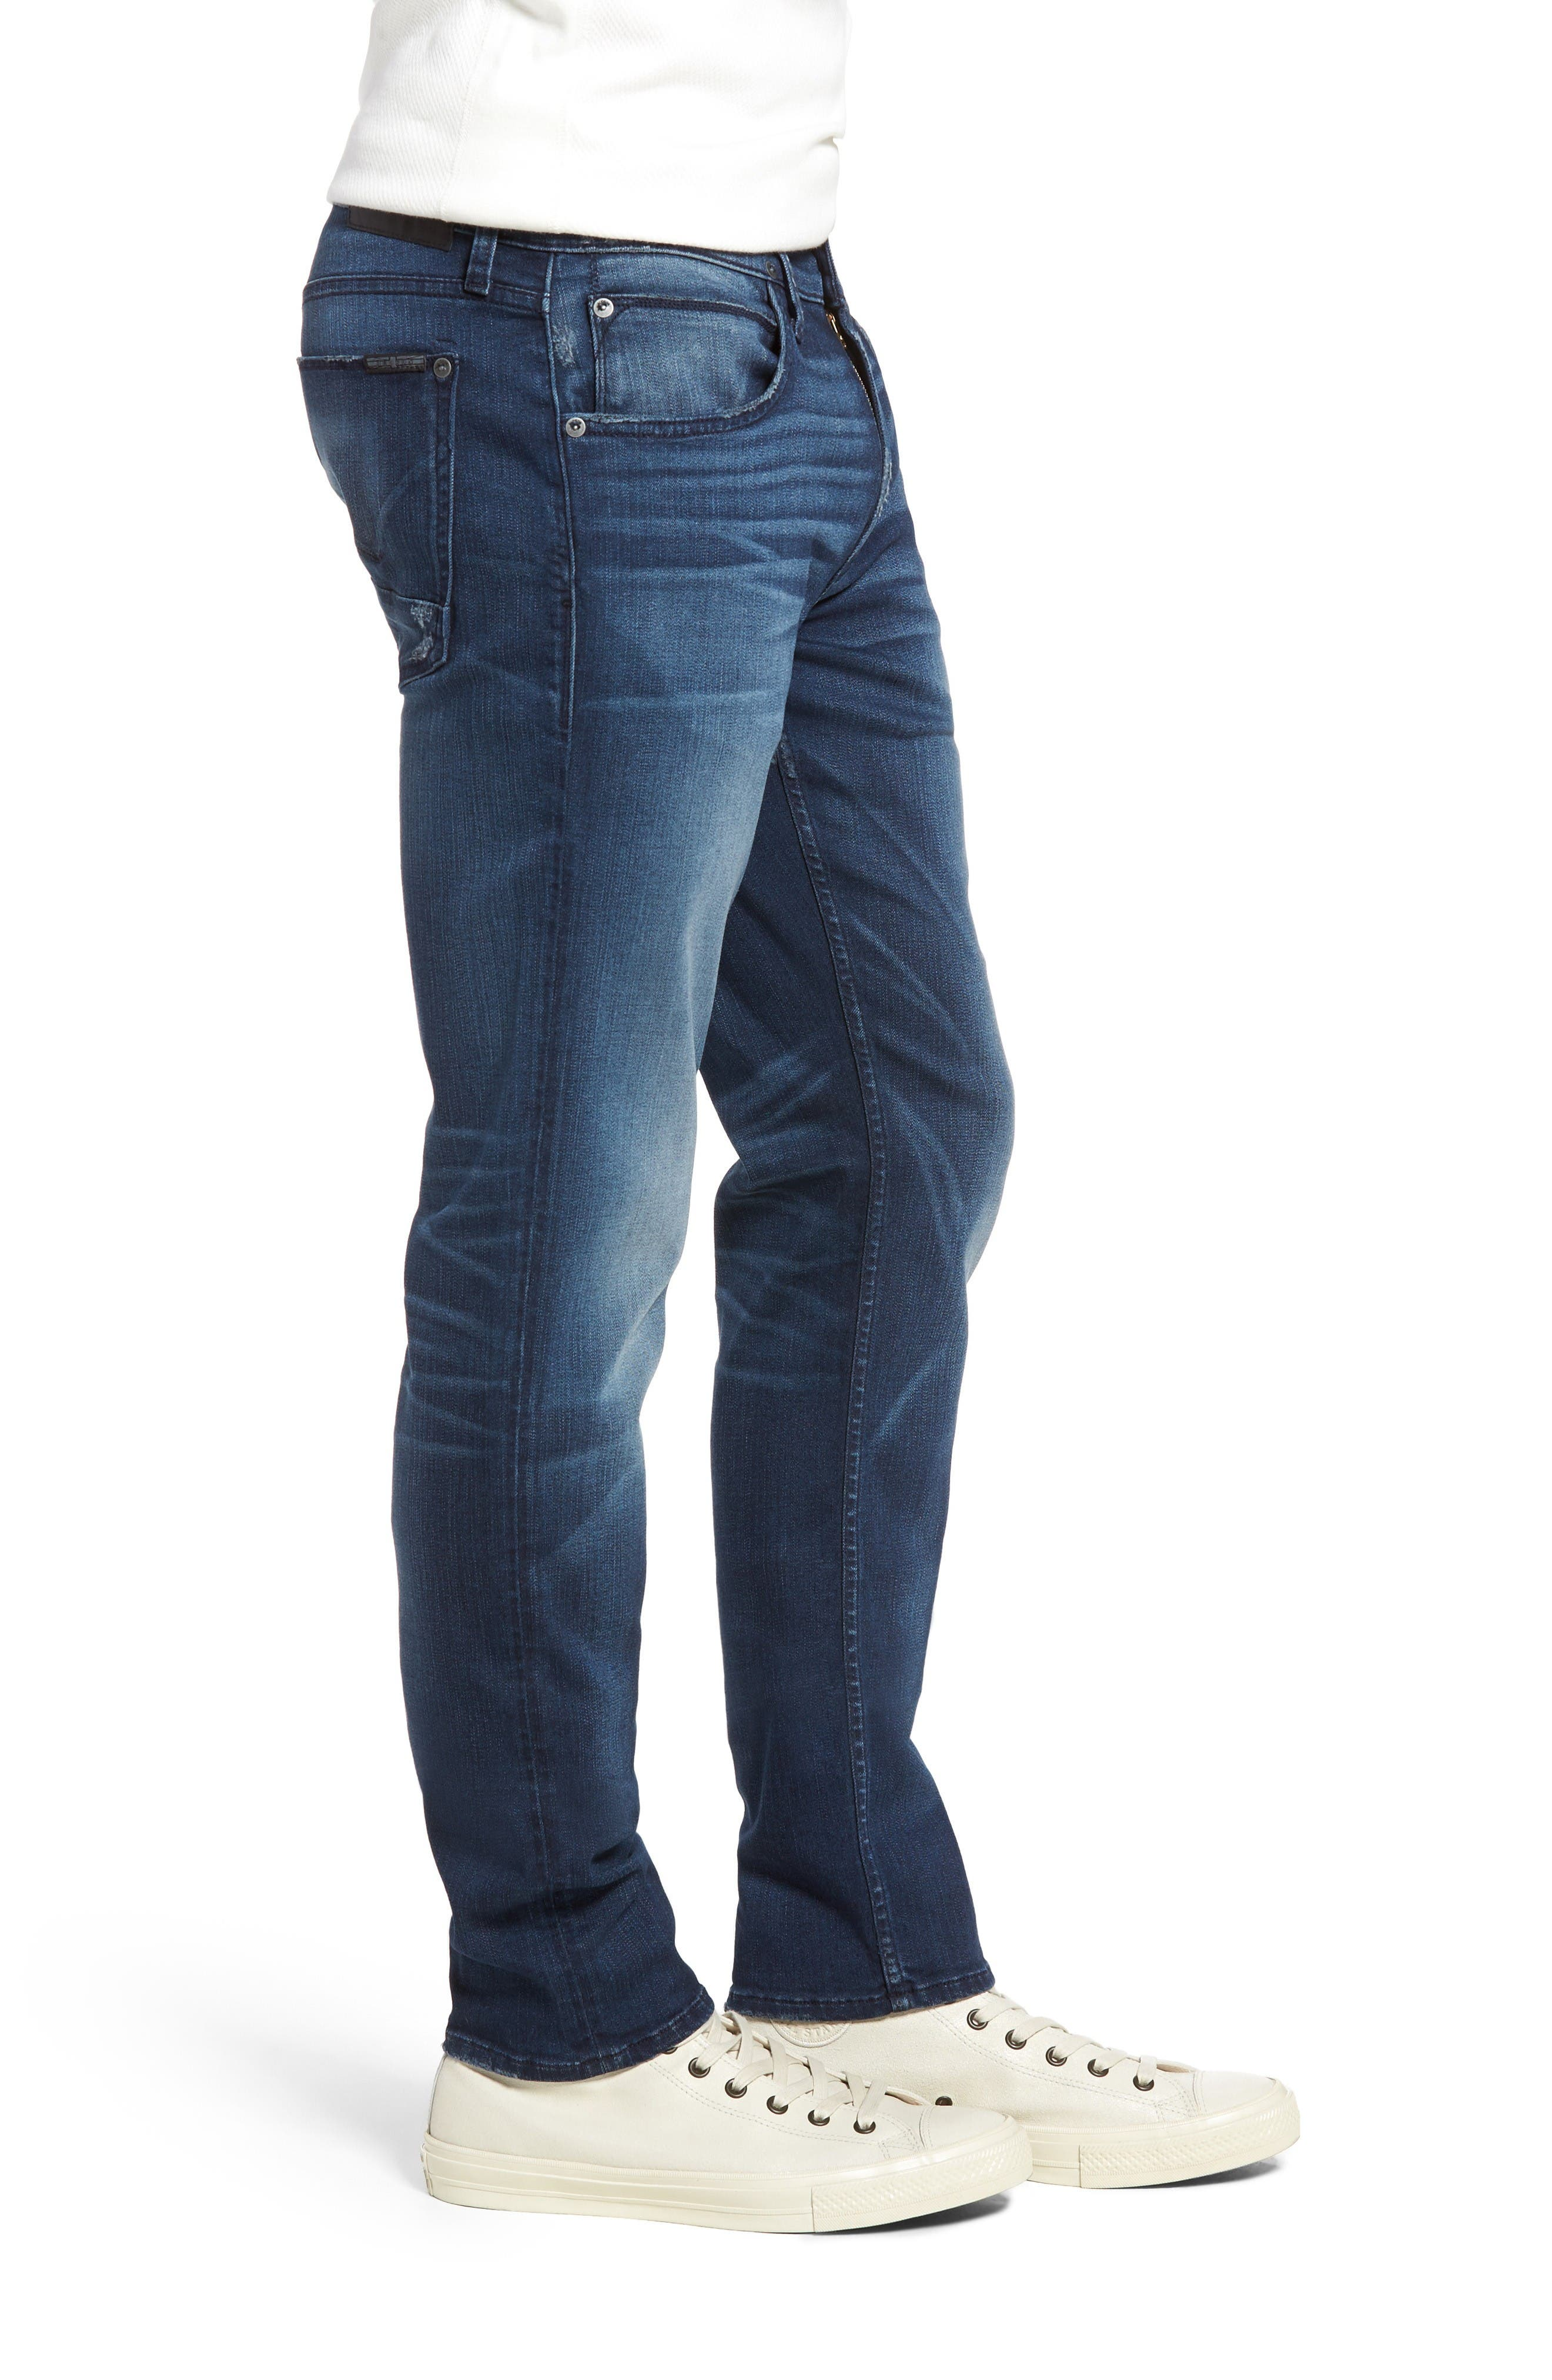 Blake Slim Fit Jeans,                             Alternate thumbnail 3, color,                             Napoleon Blue